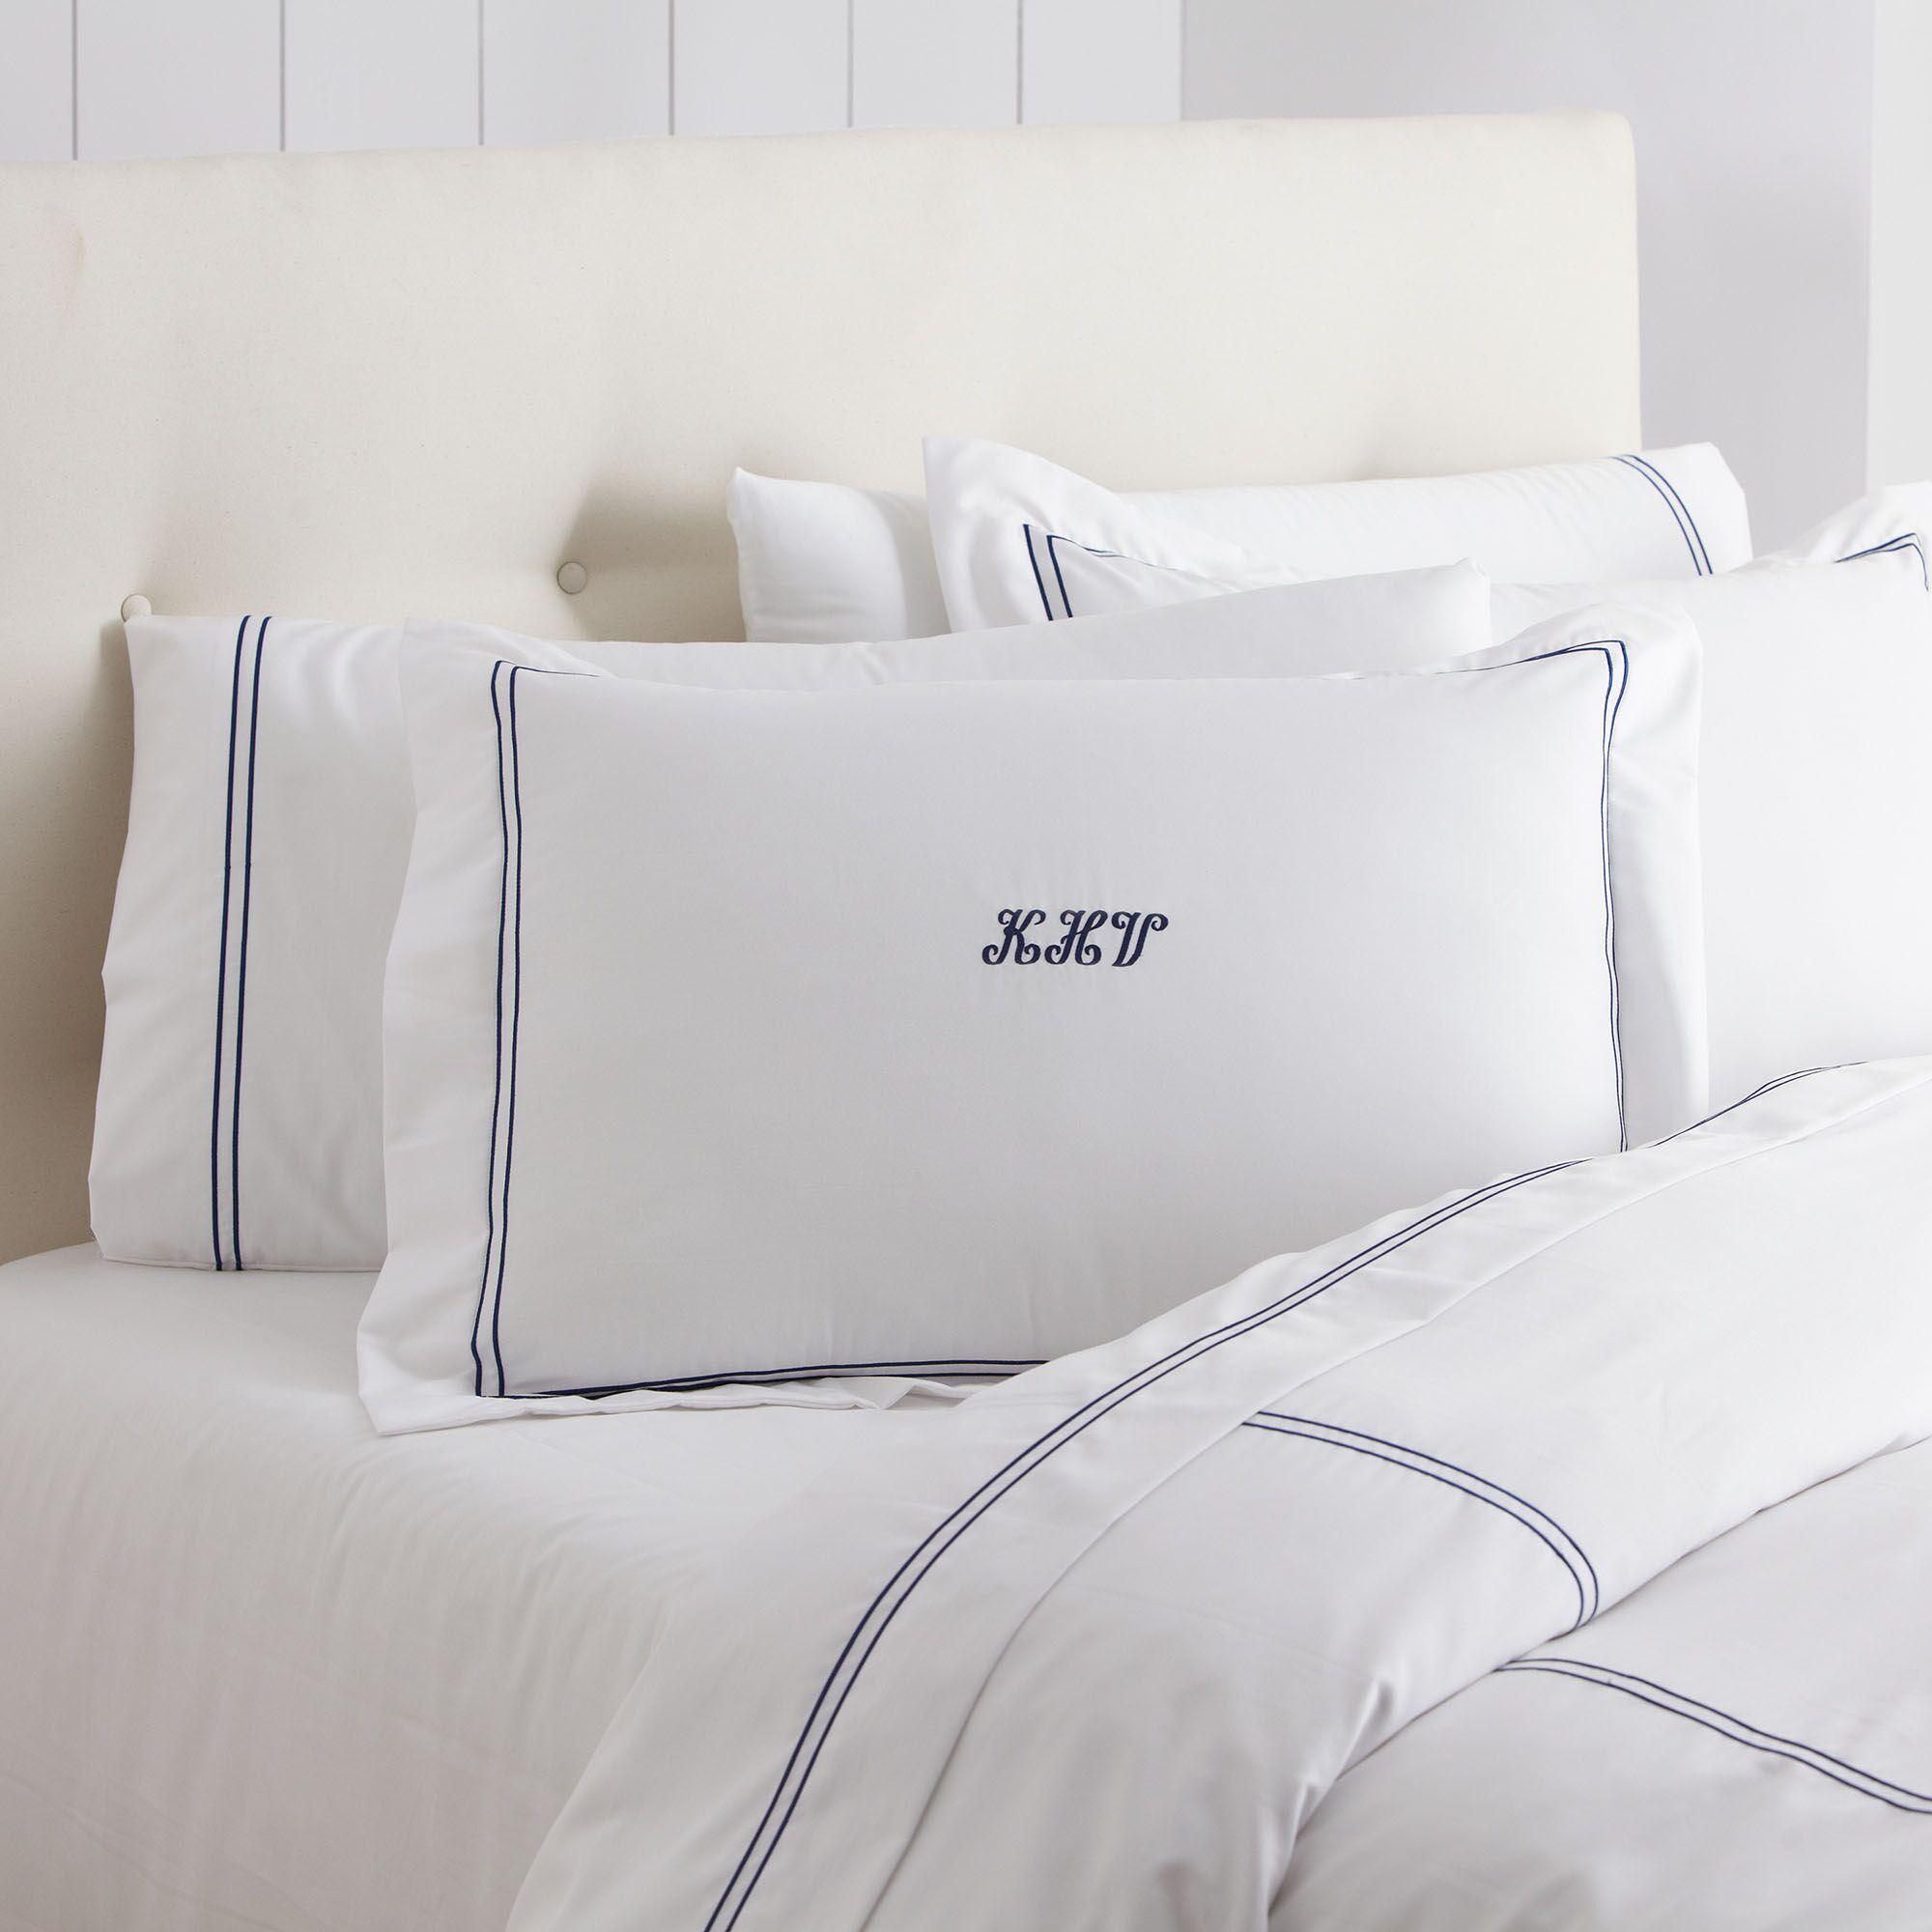 Alexa Sham Color: Navy & White, Size: King